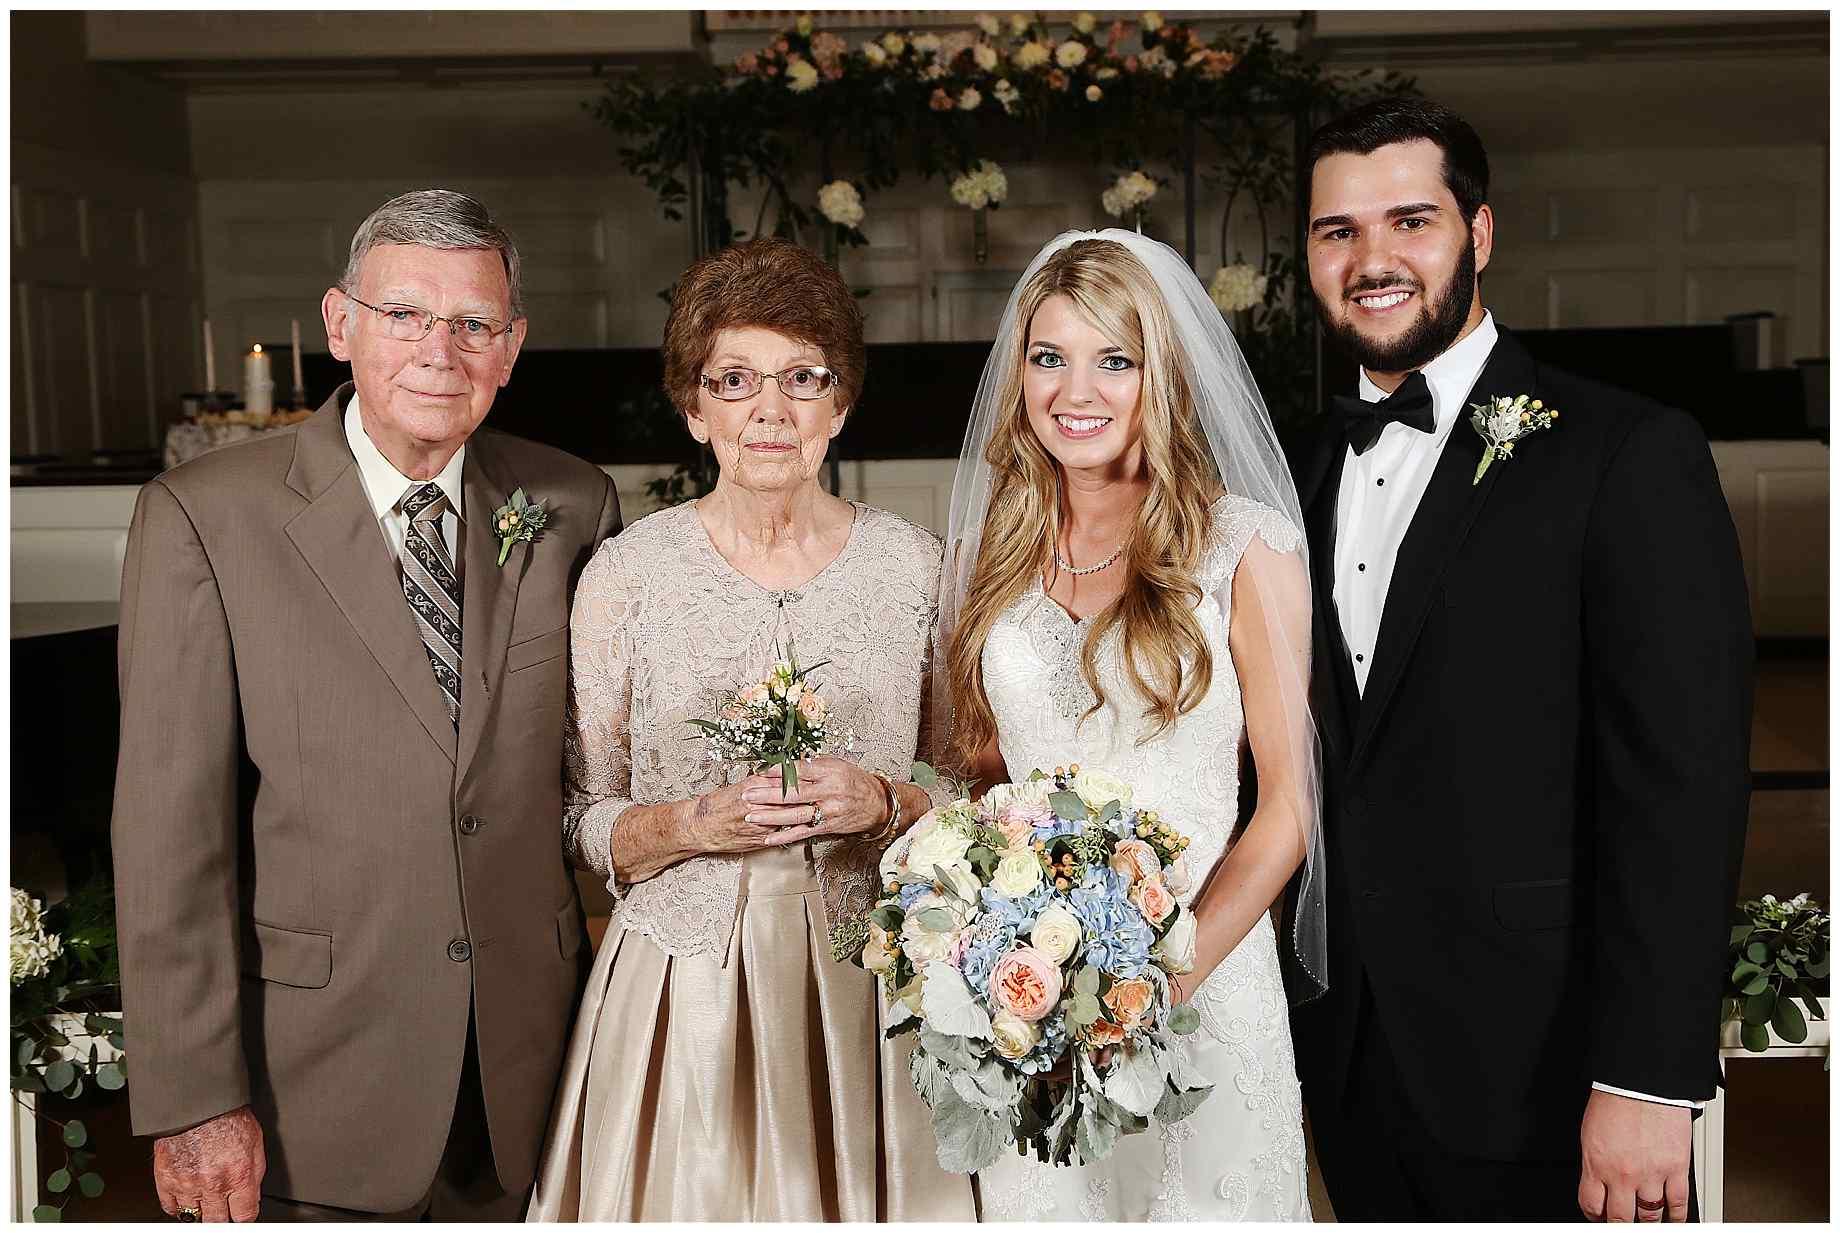 centenary-college-wedding-photos-shreveport-017b